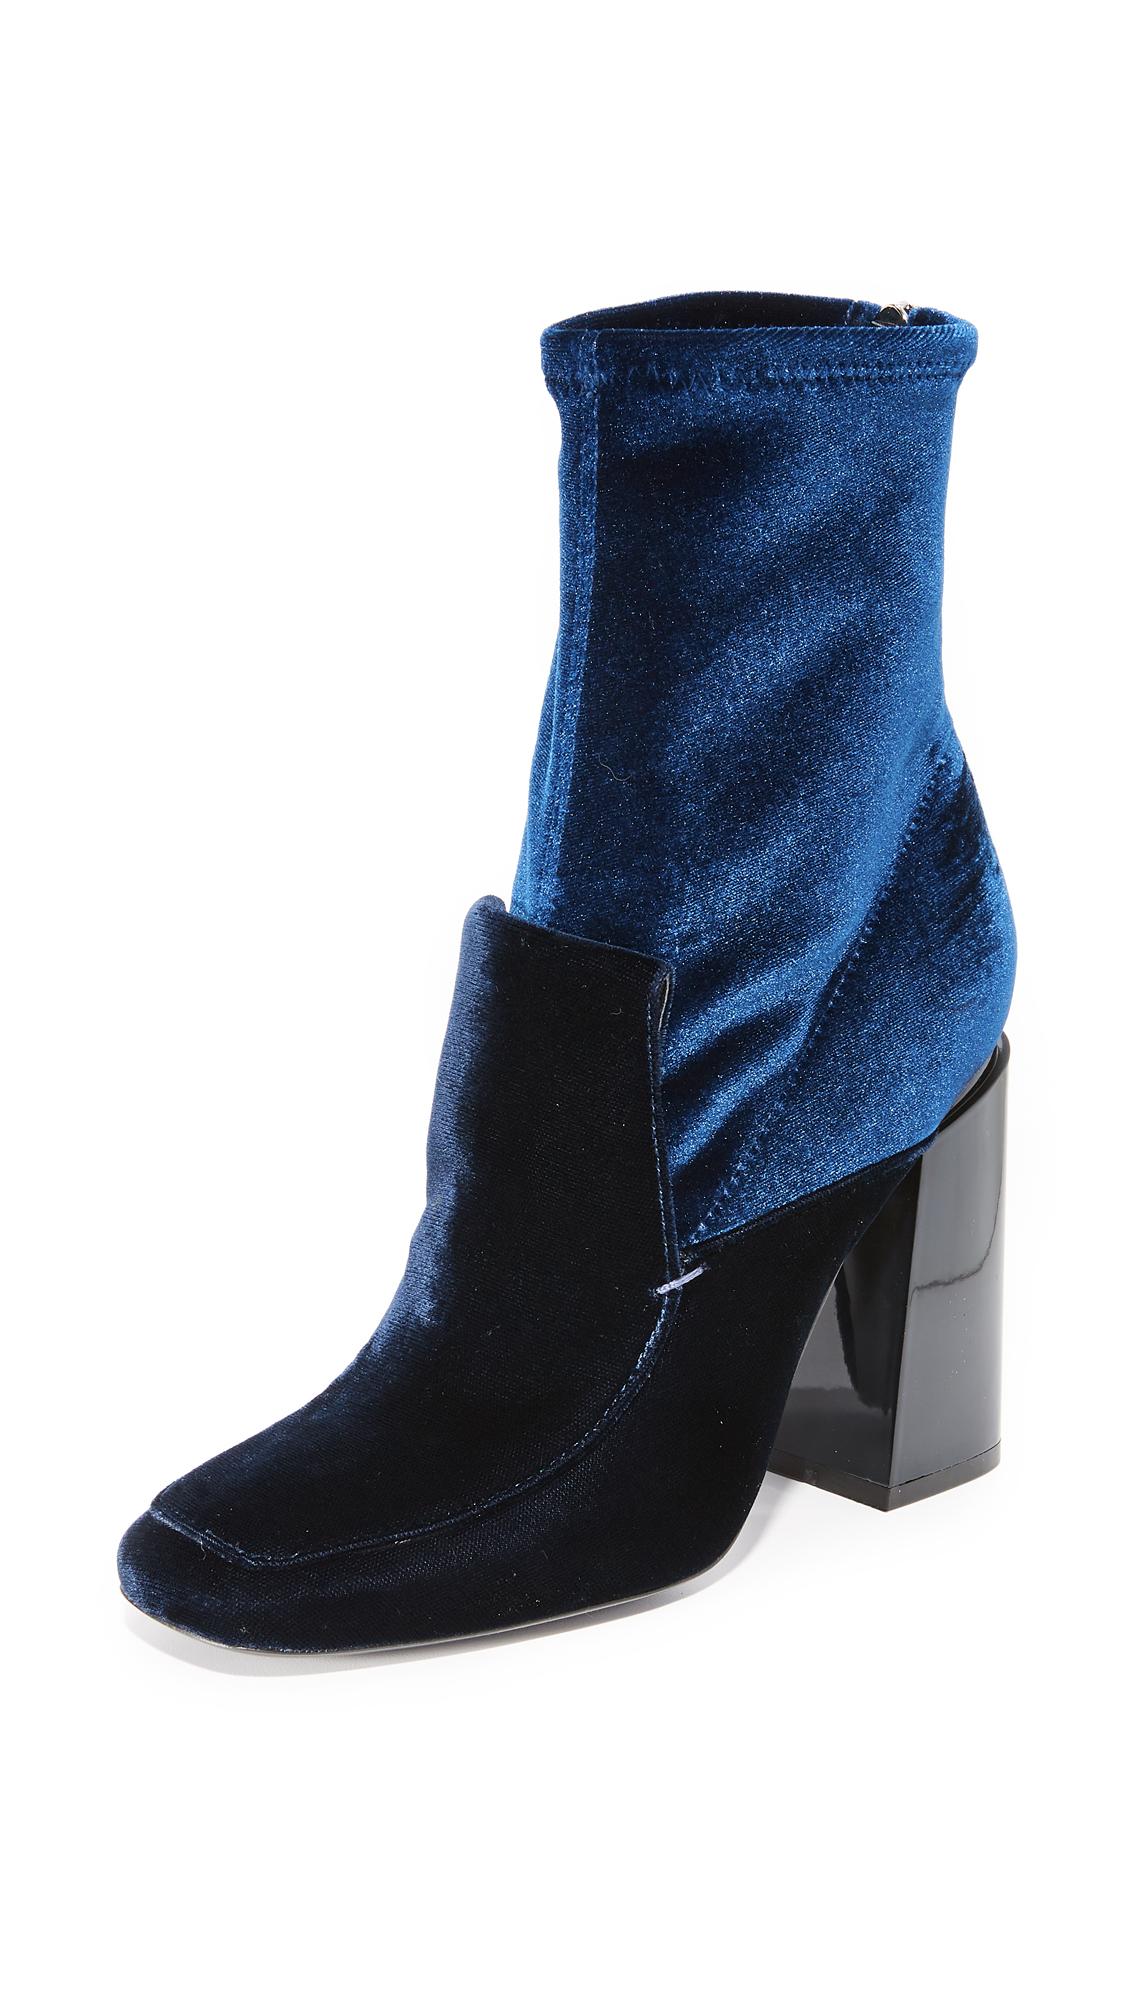 Sigerson Morrison Joanna II Velvet Booties - Blue Notte